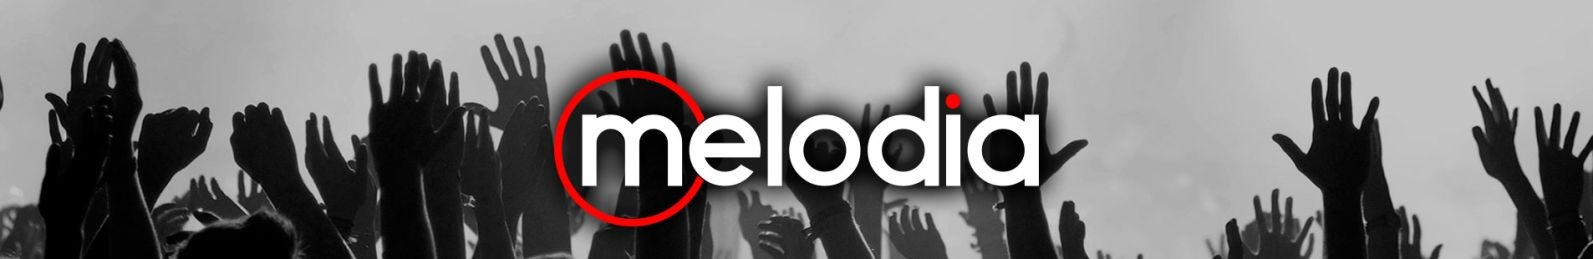 Melodia Musik Online